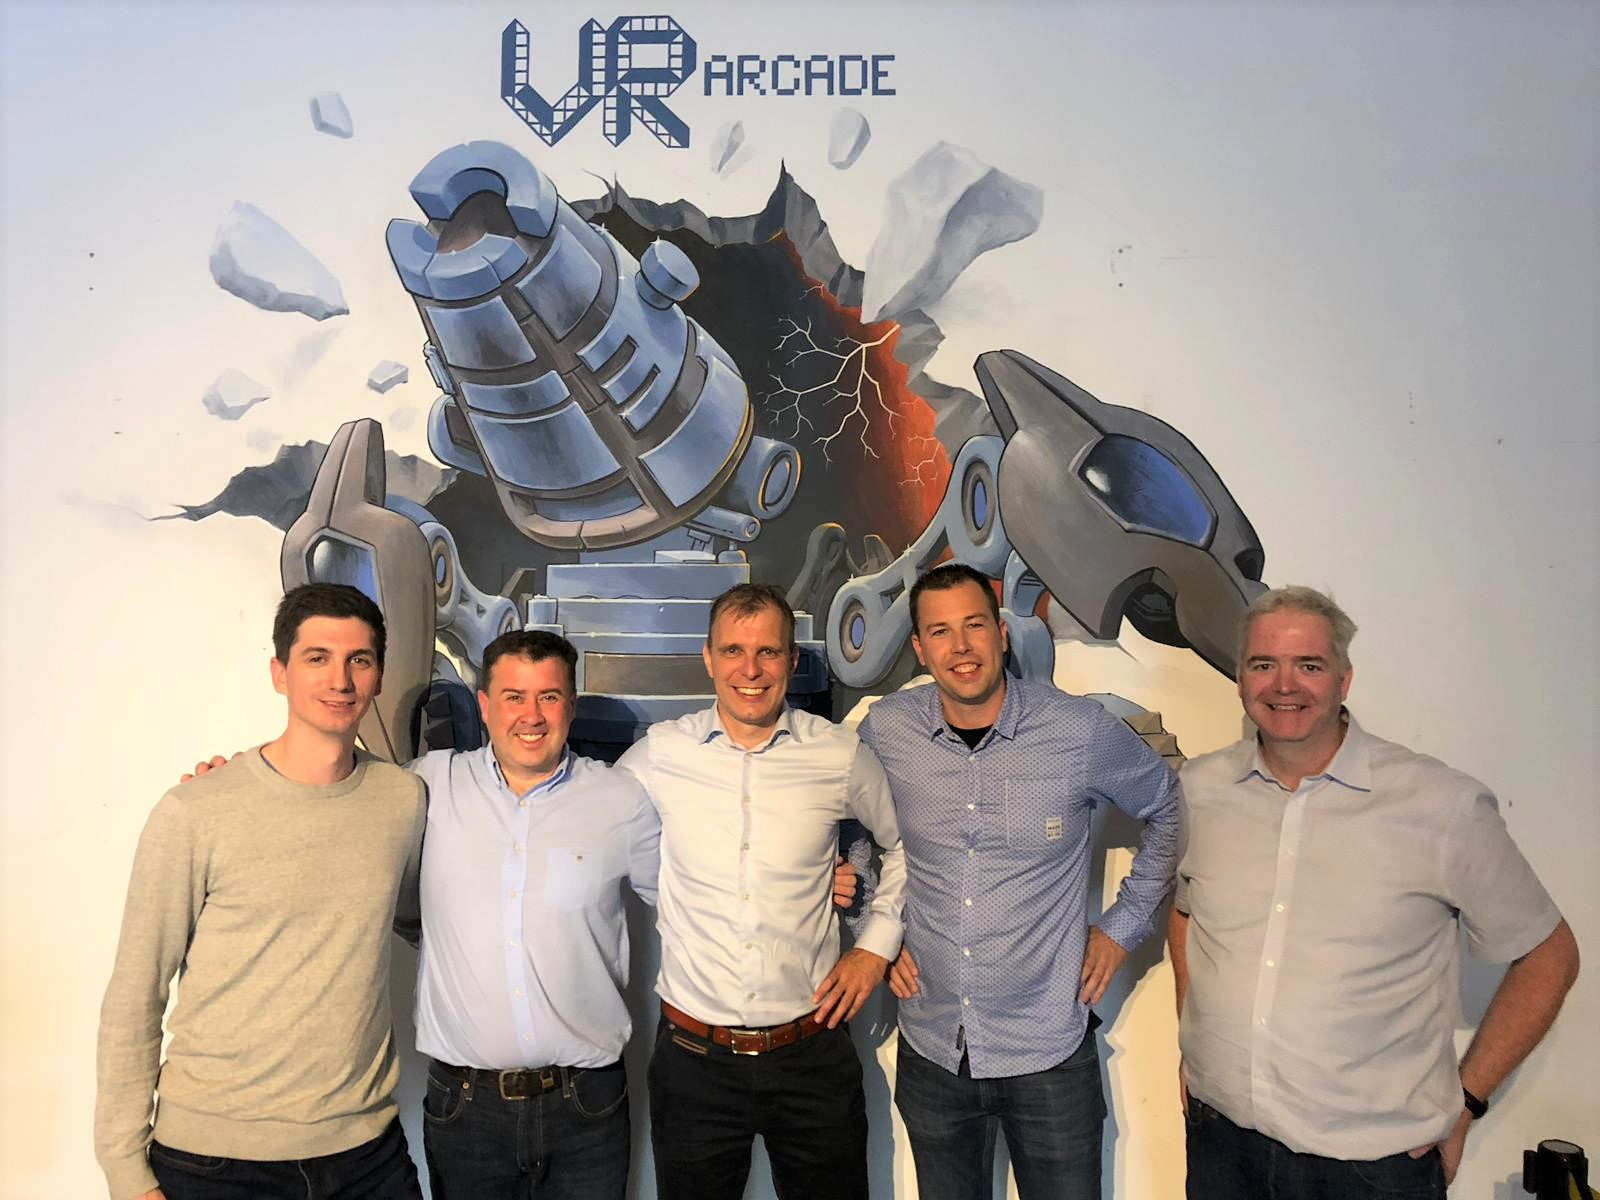 VR Arcade groepsfoto